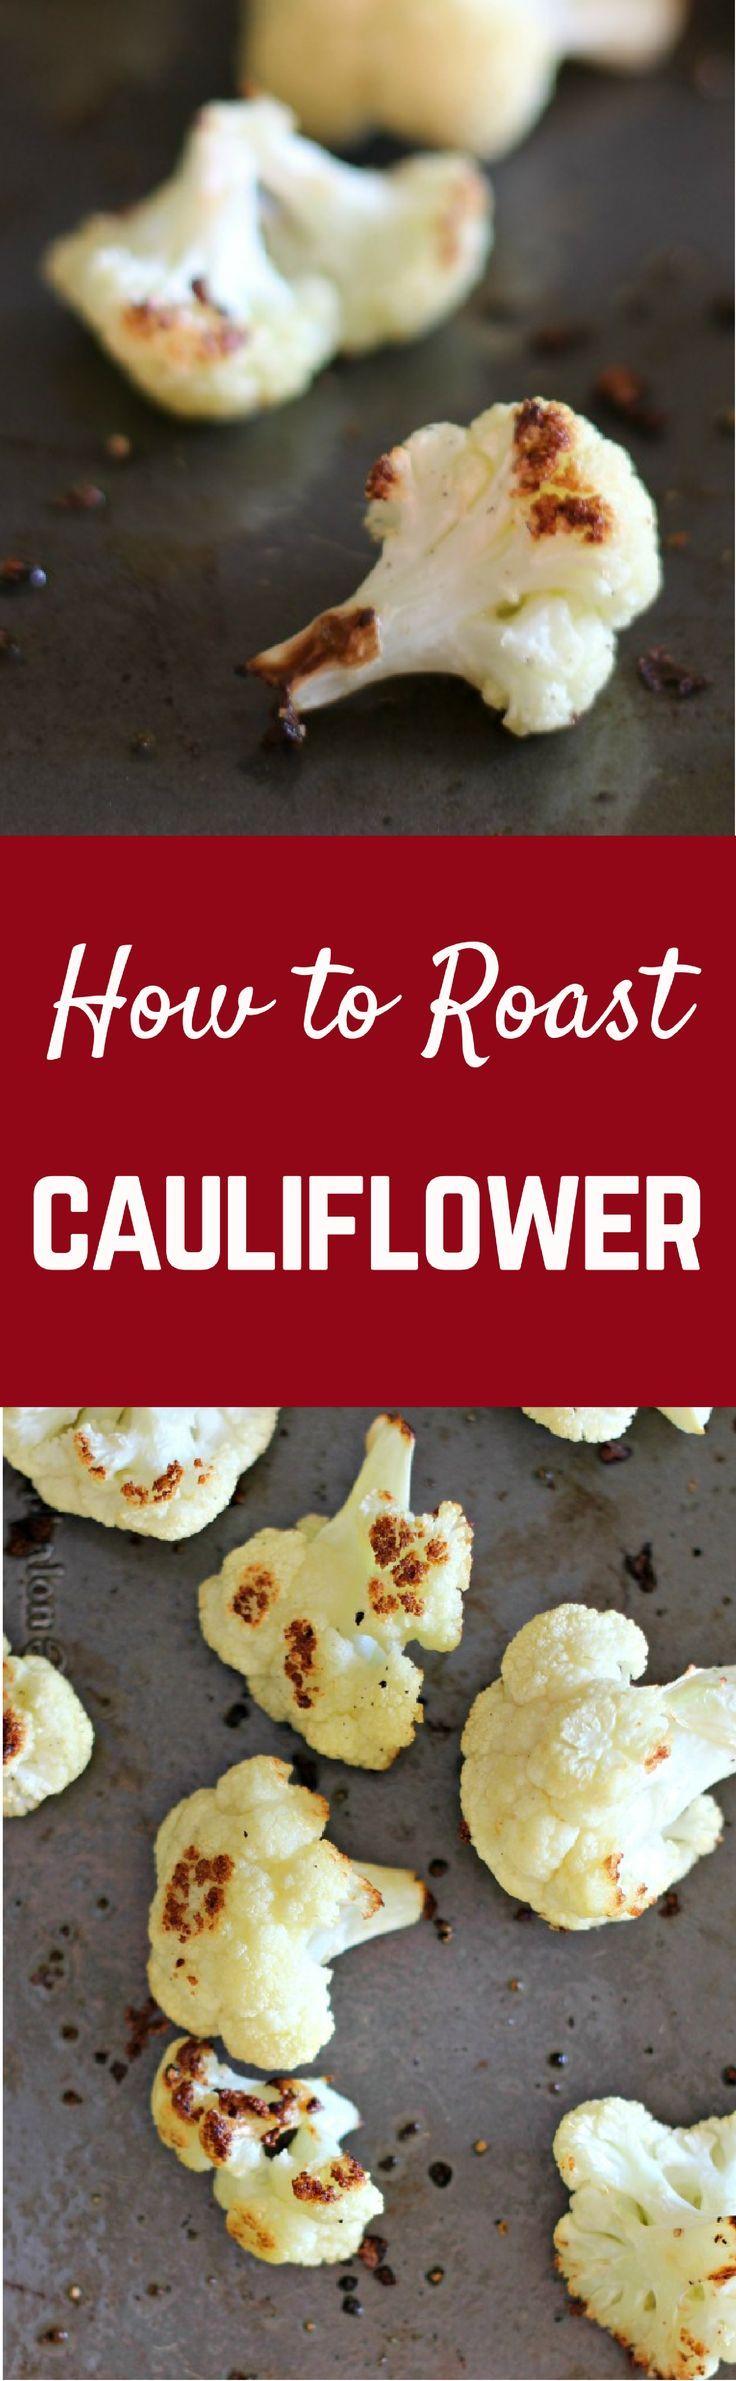 How to Roast Cauliflower | http://RachelCooks.com